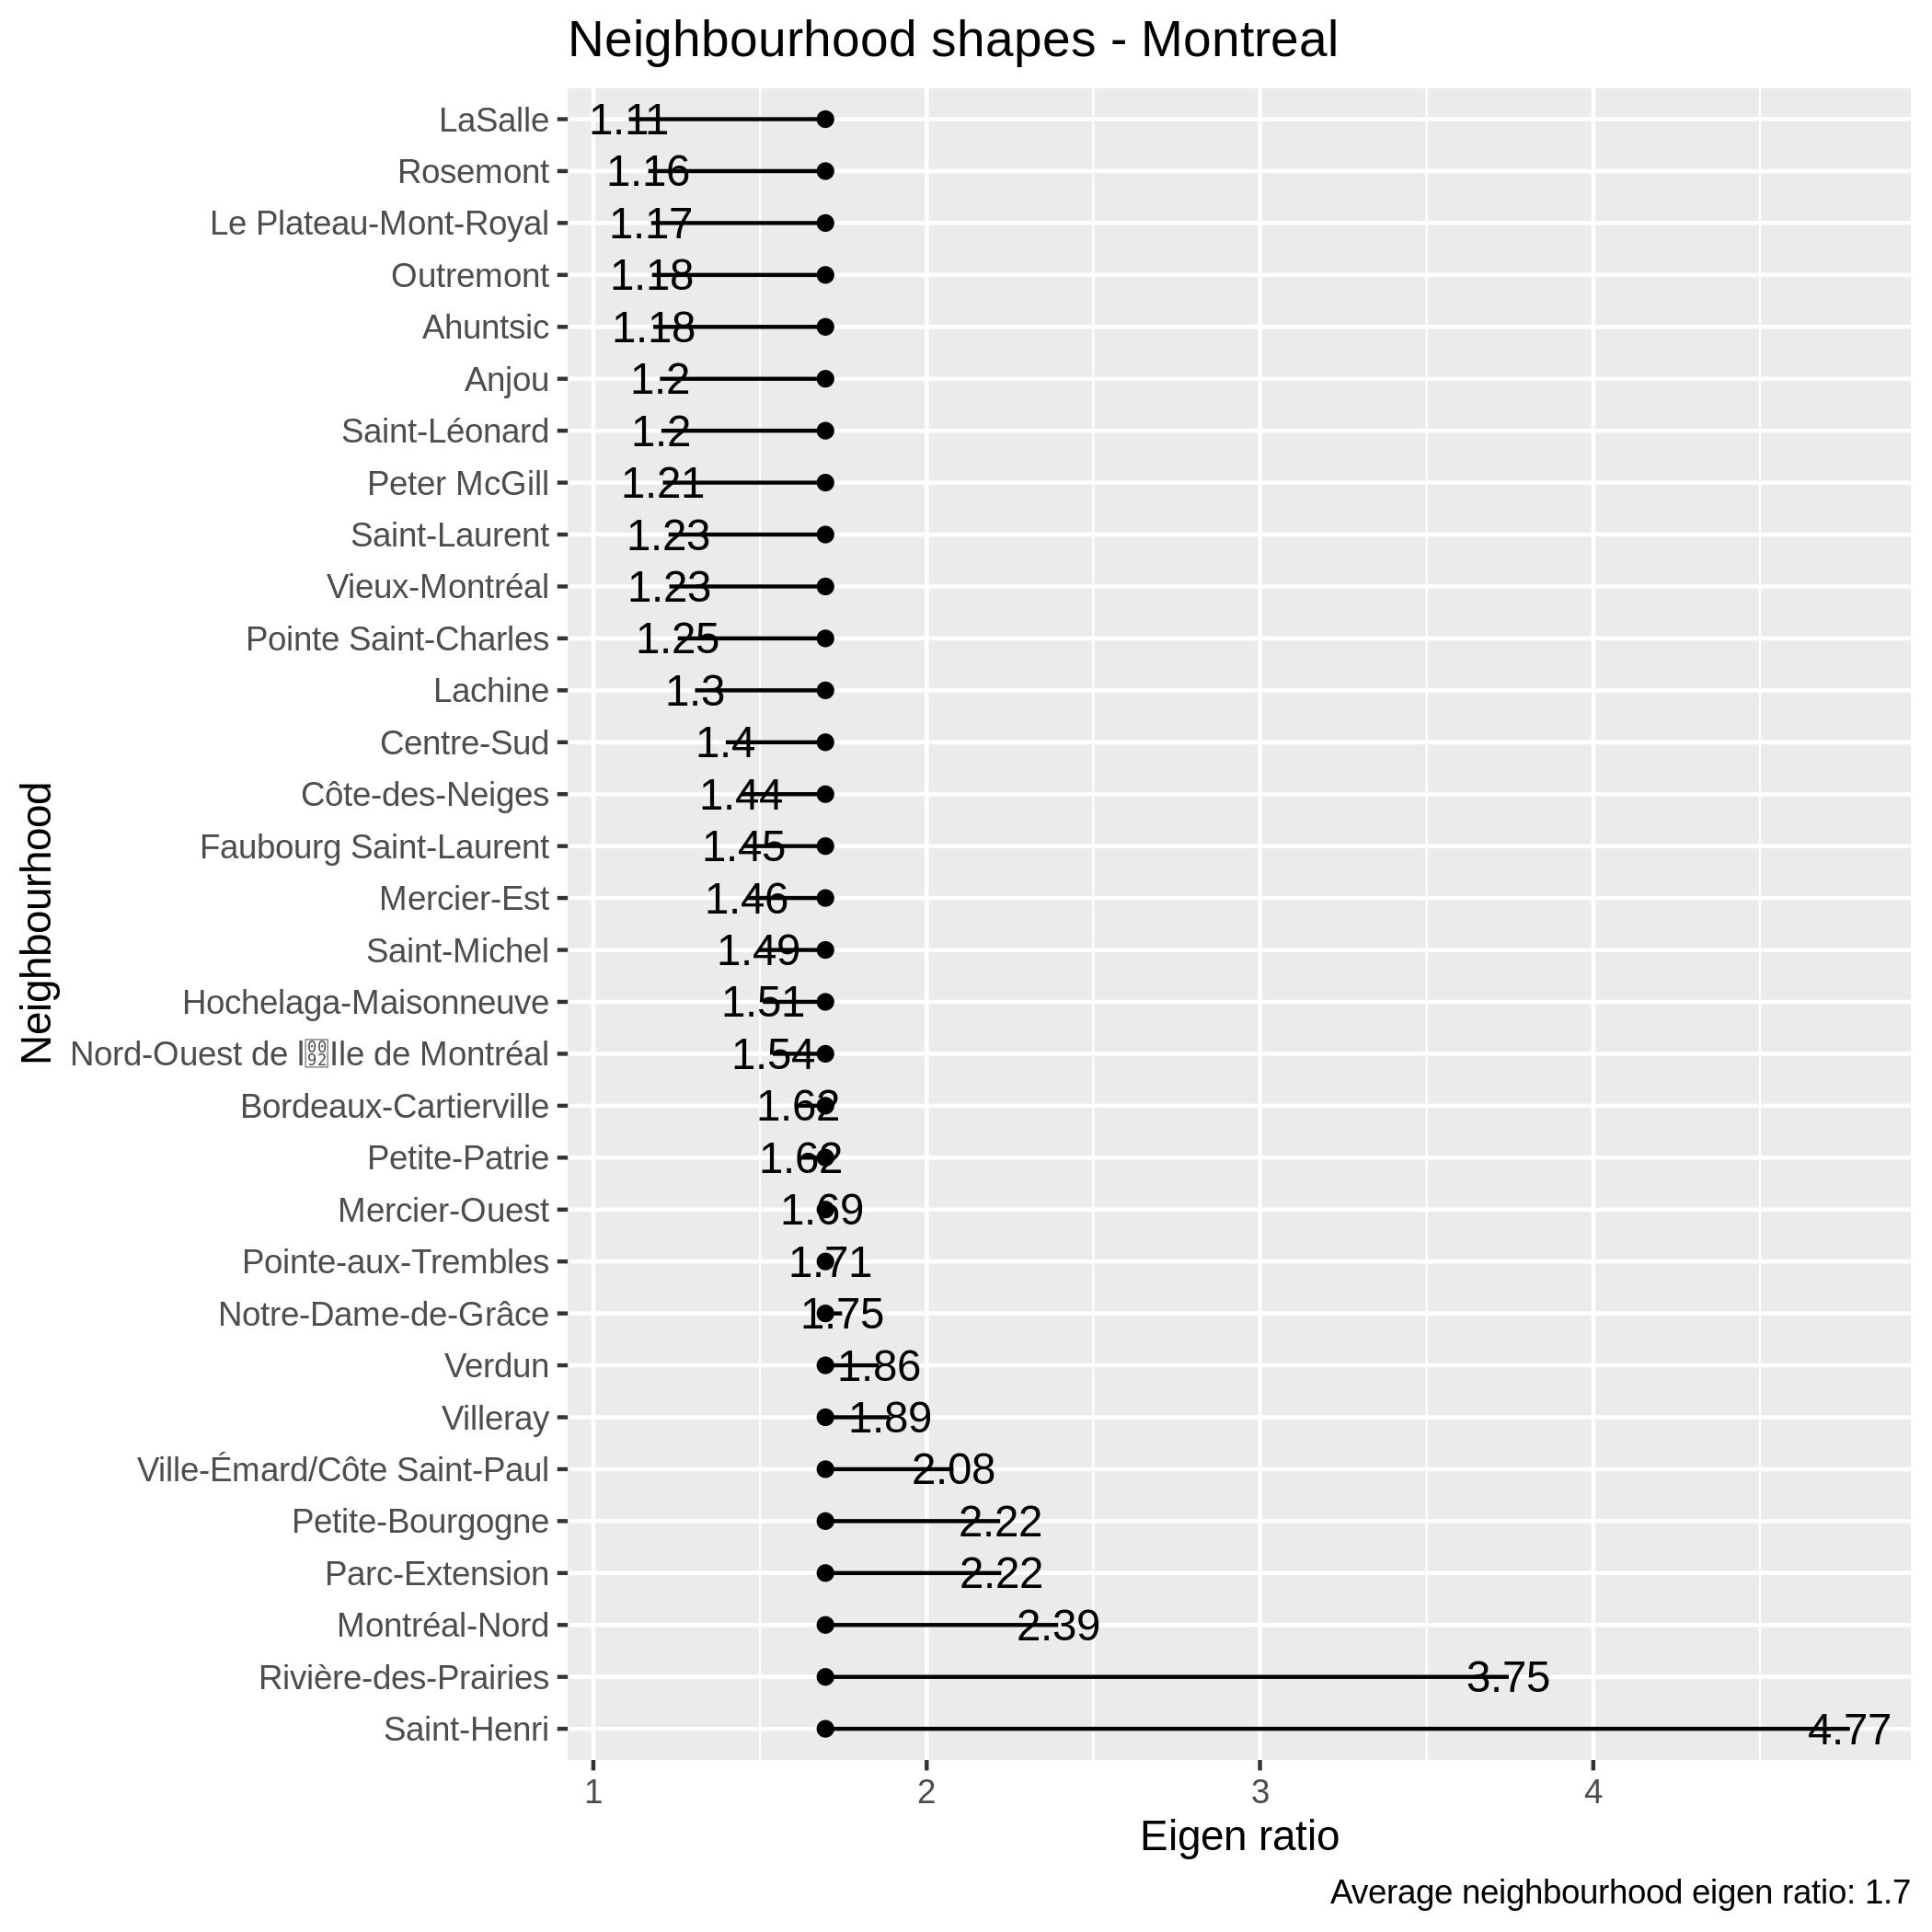 Comparing the eigenratio distribution by neighbourhood